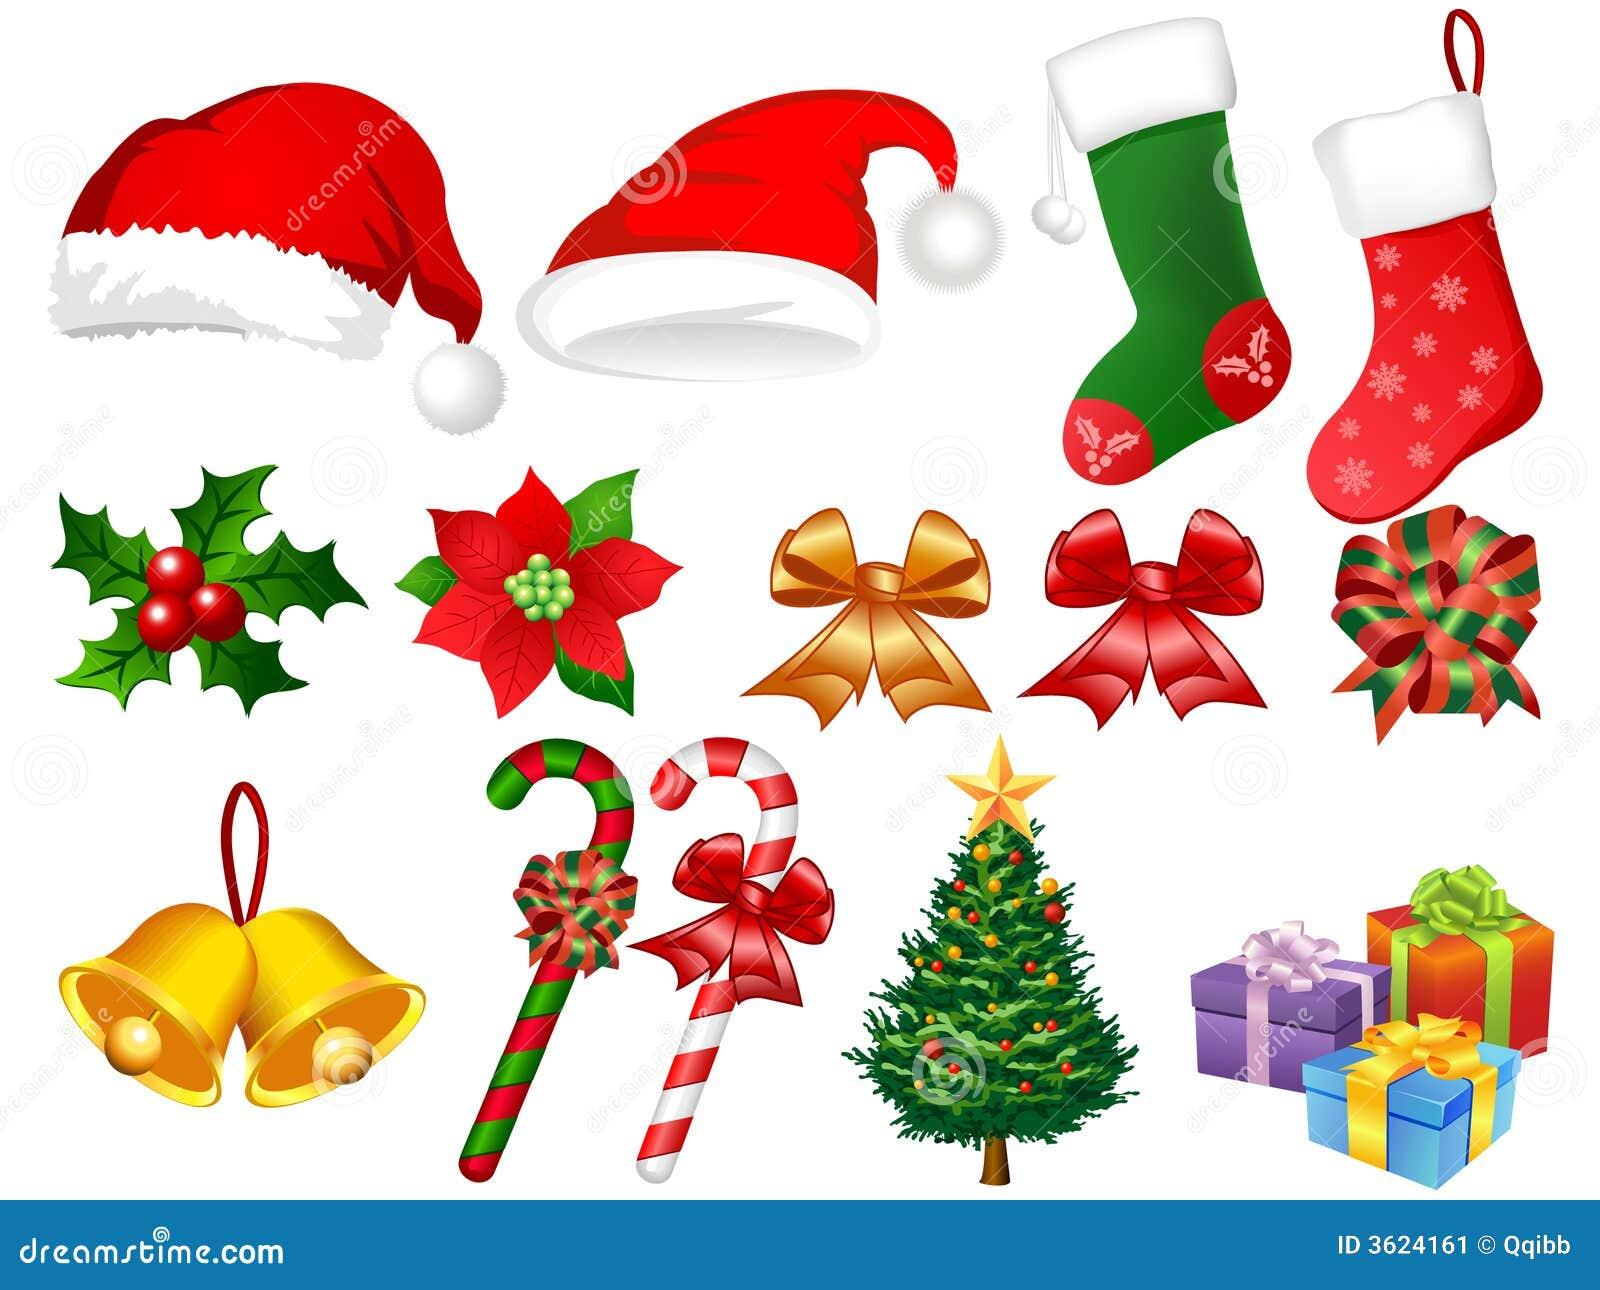 3 Foot Christmas Tree